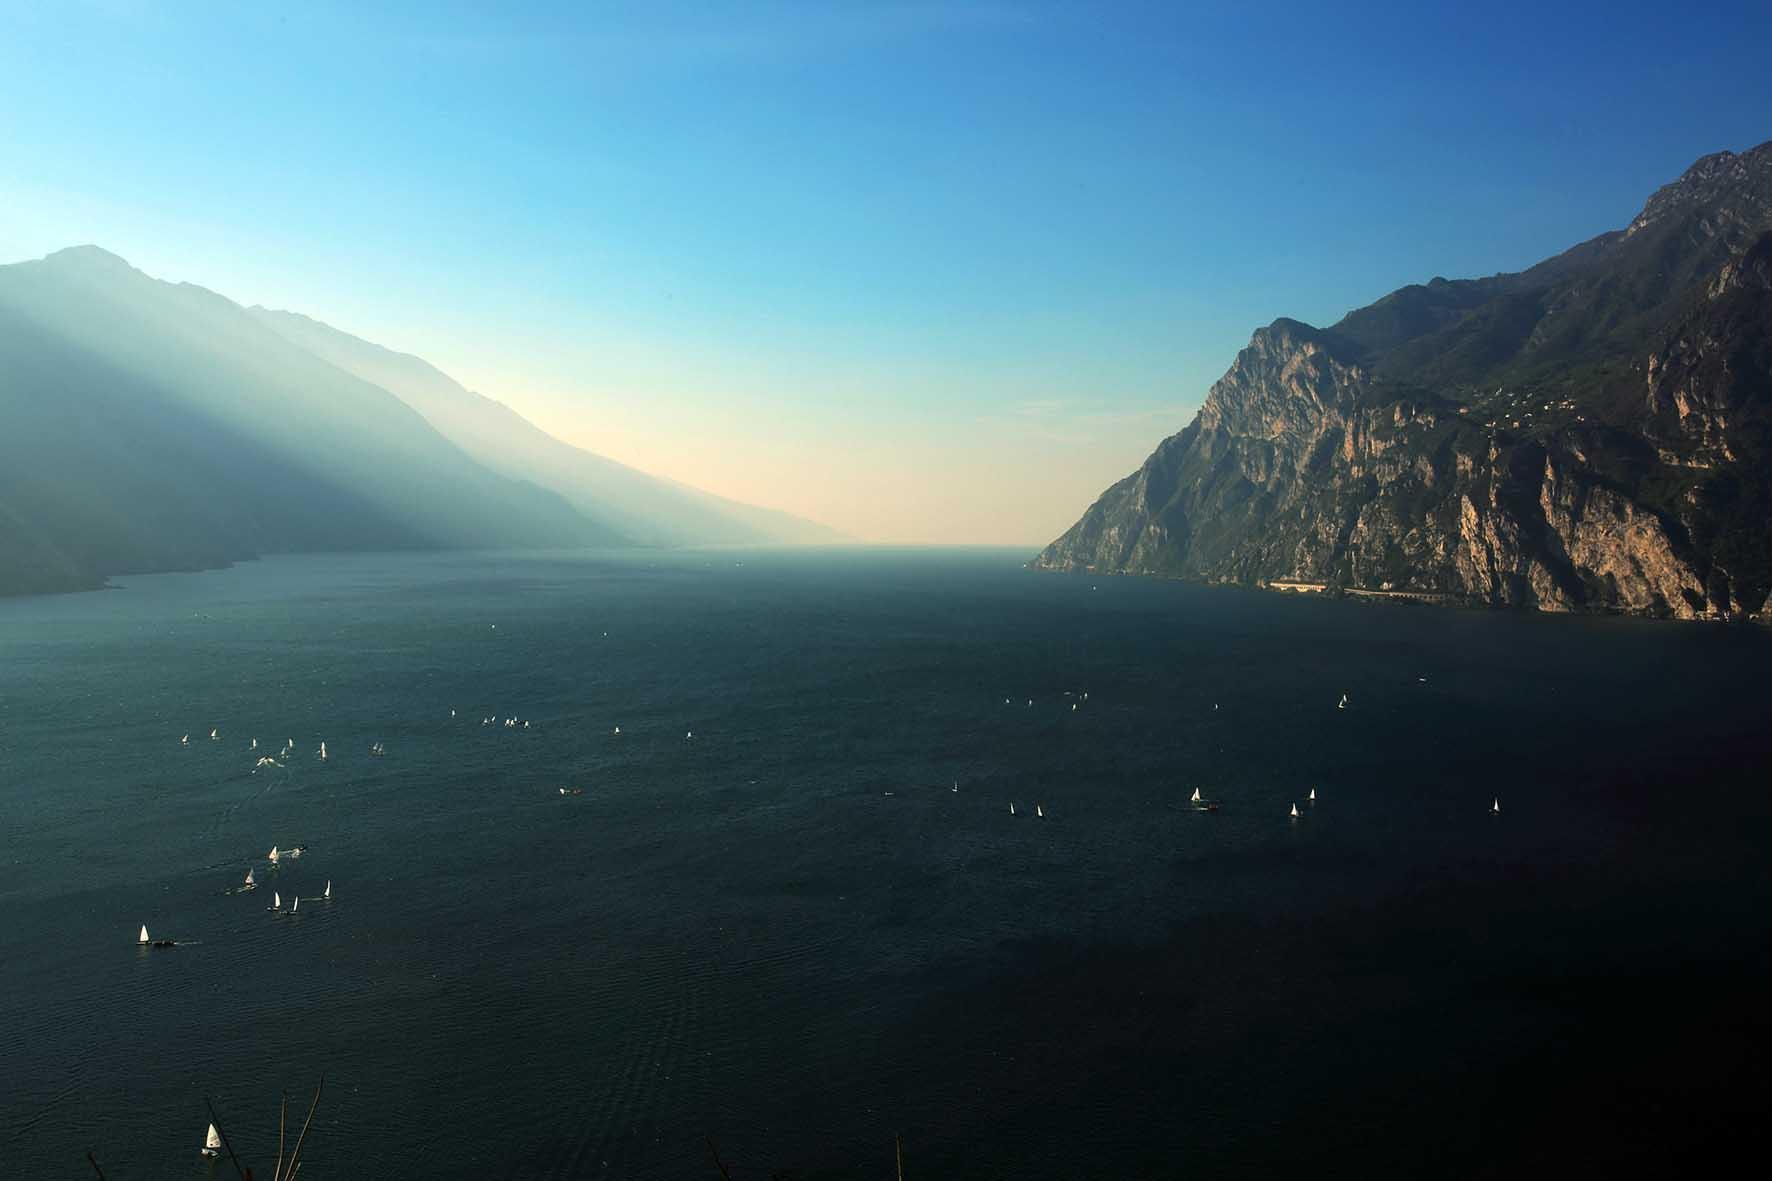 Garda Dop olio lago panorama 2